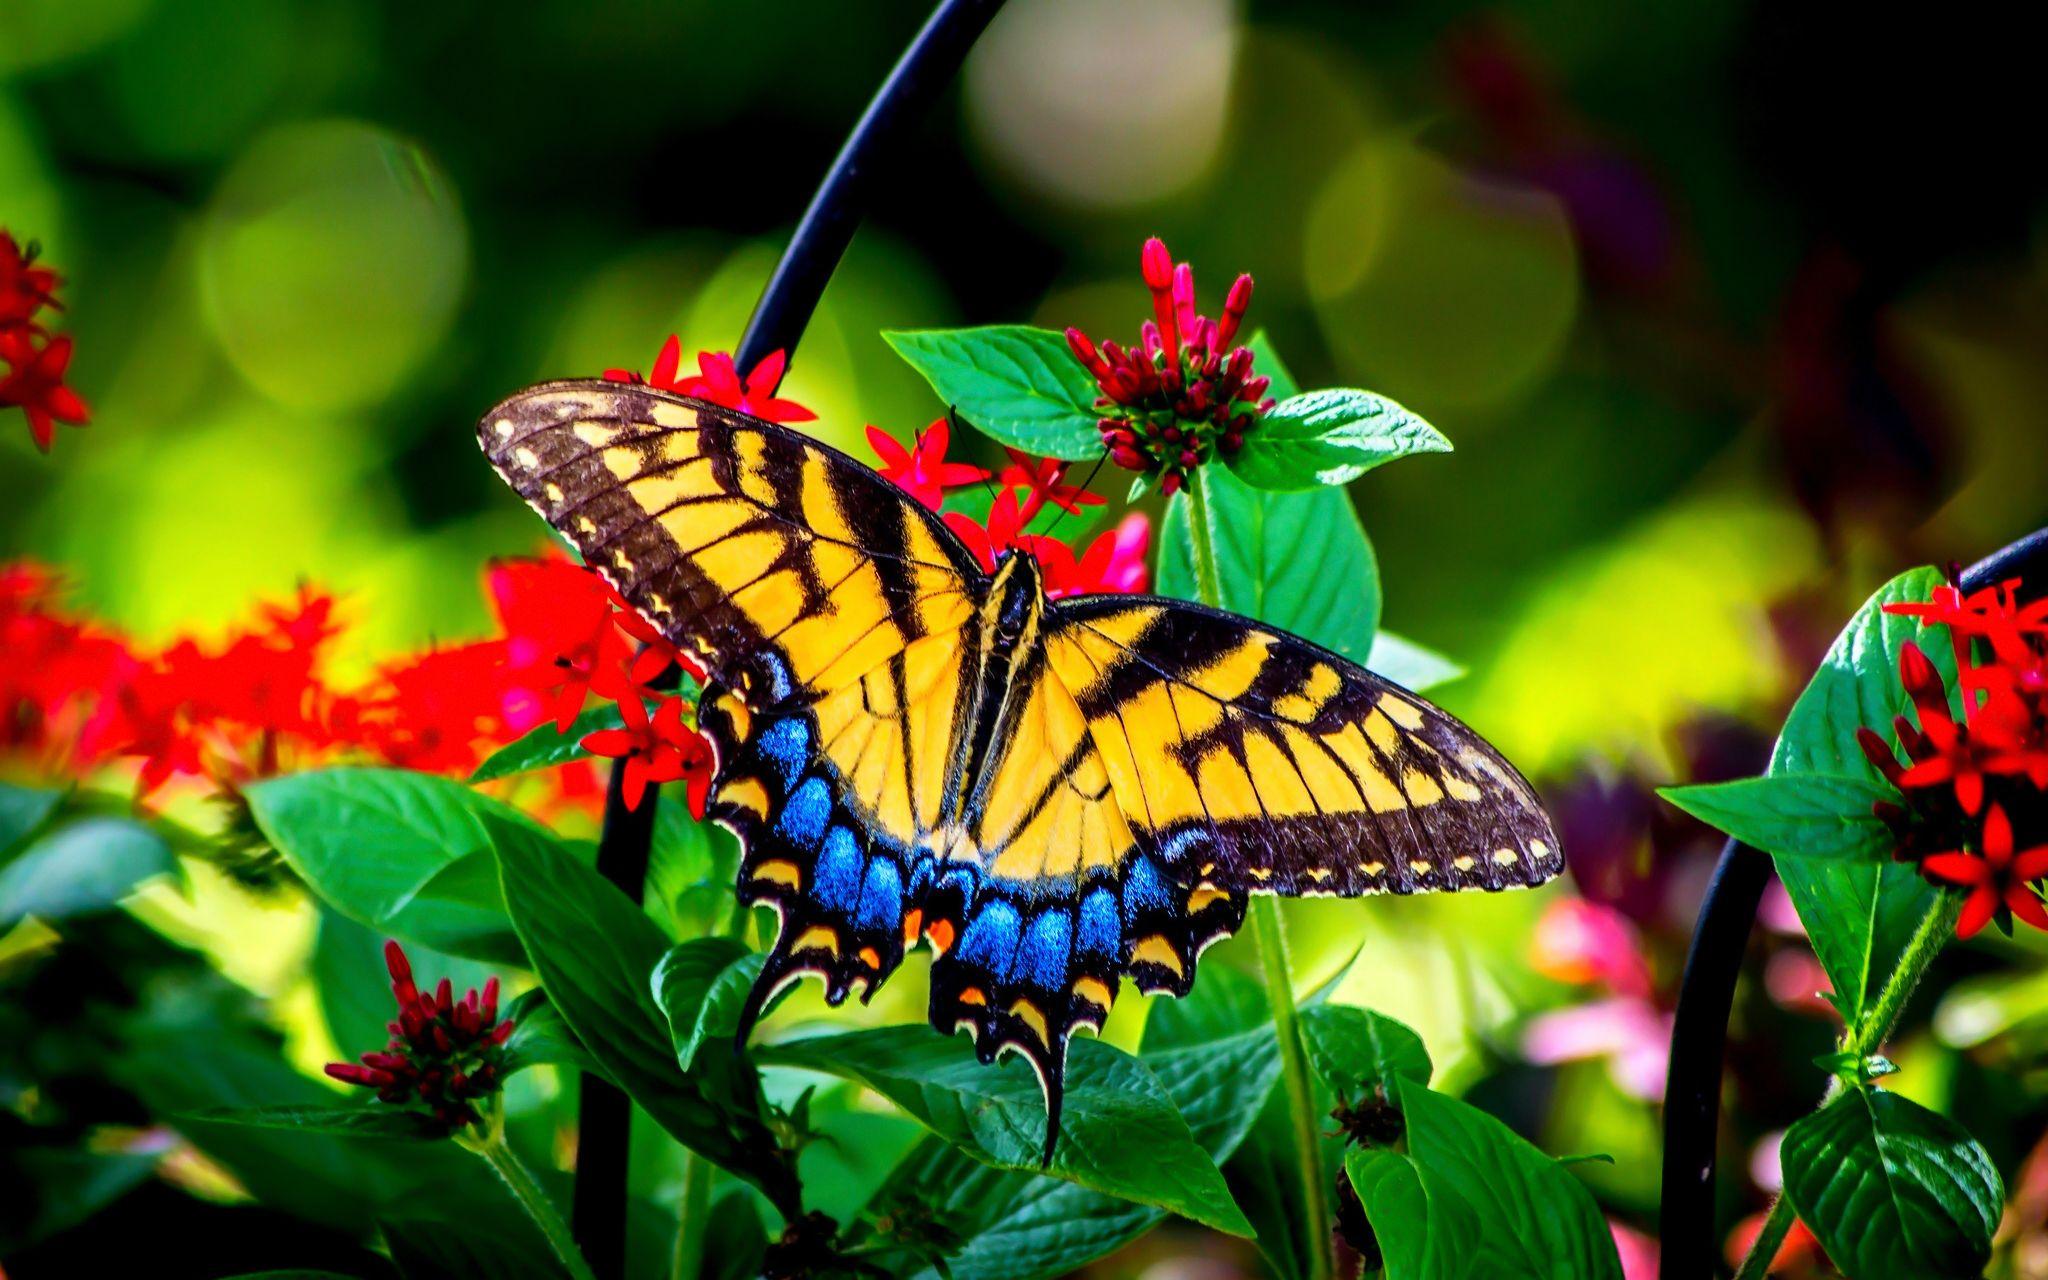 Beautiful Butterflies In Nature Butterfly And Garden Flowers Beauty Nature Hd Wallpap Butterfly Wallpaper Backgrounds Beautiful Butterflies Butterfly Flowers